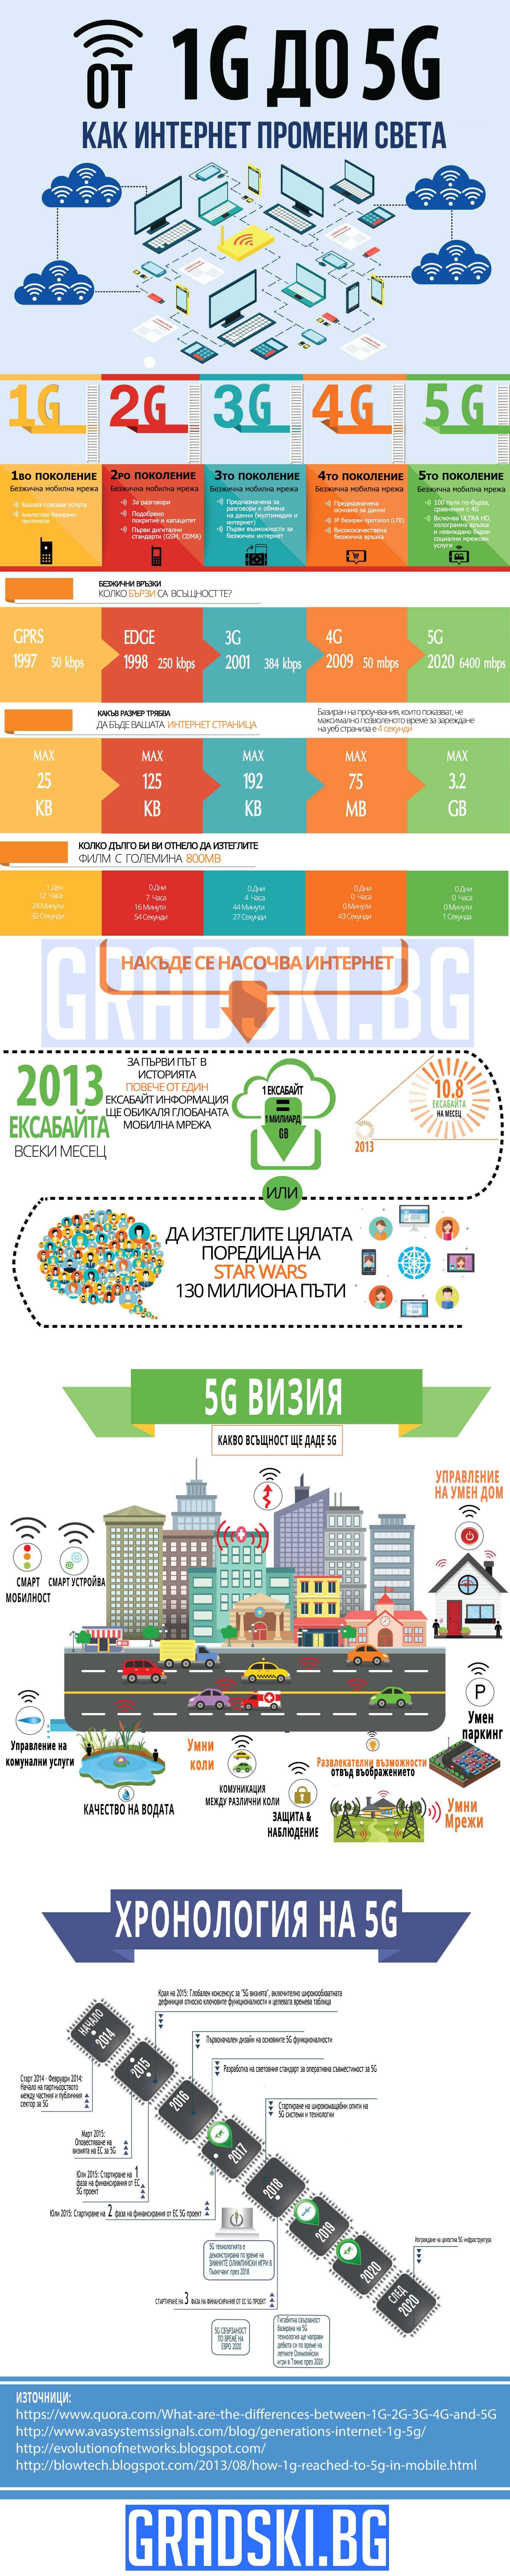 Как интернет промени смета - Инфографика